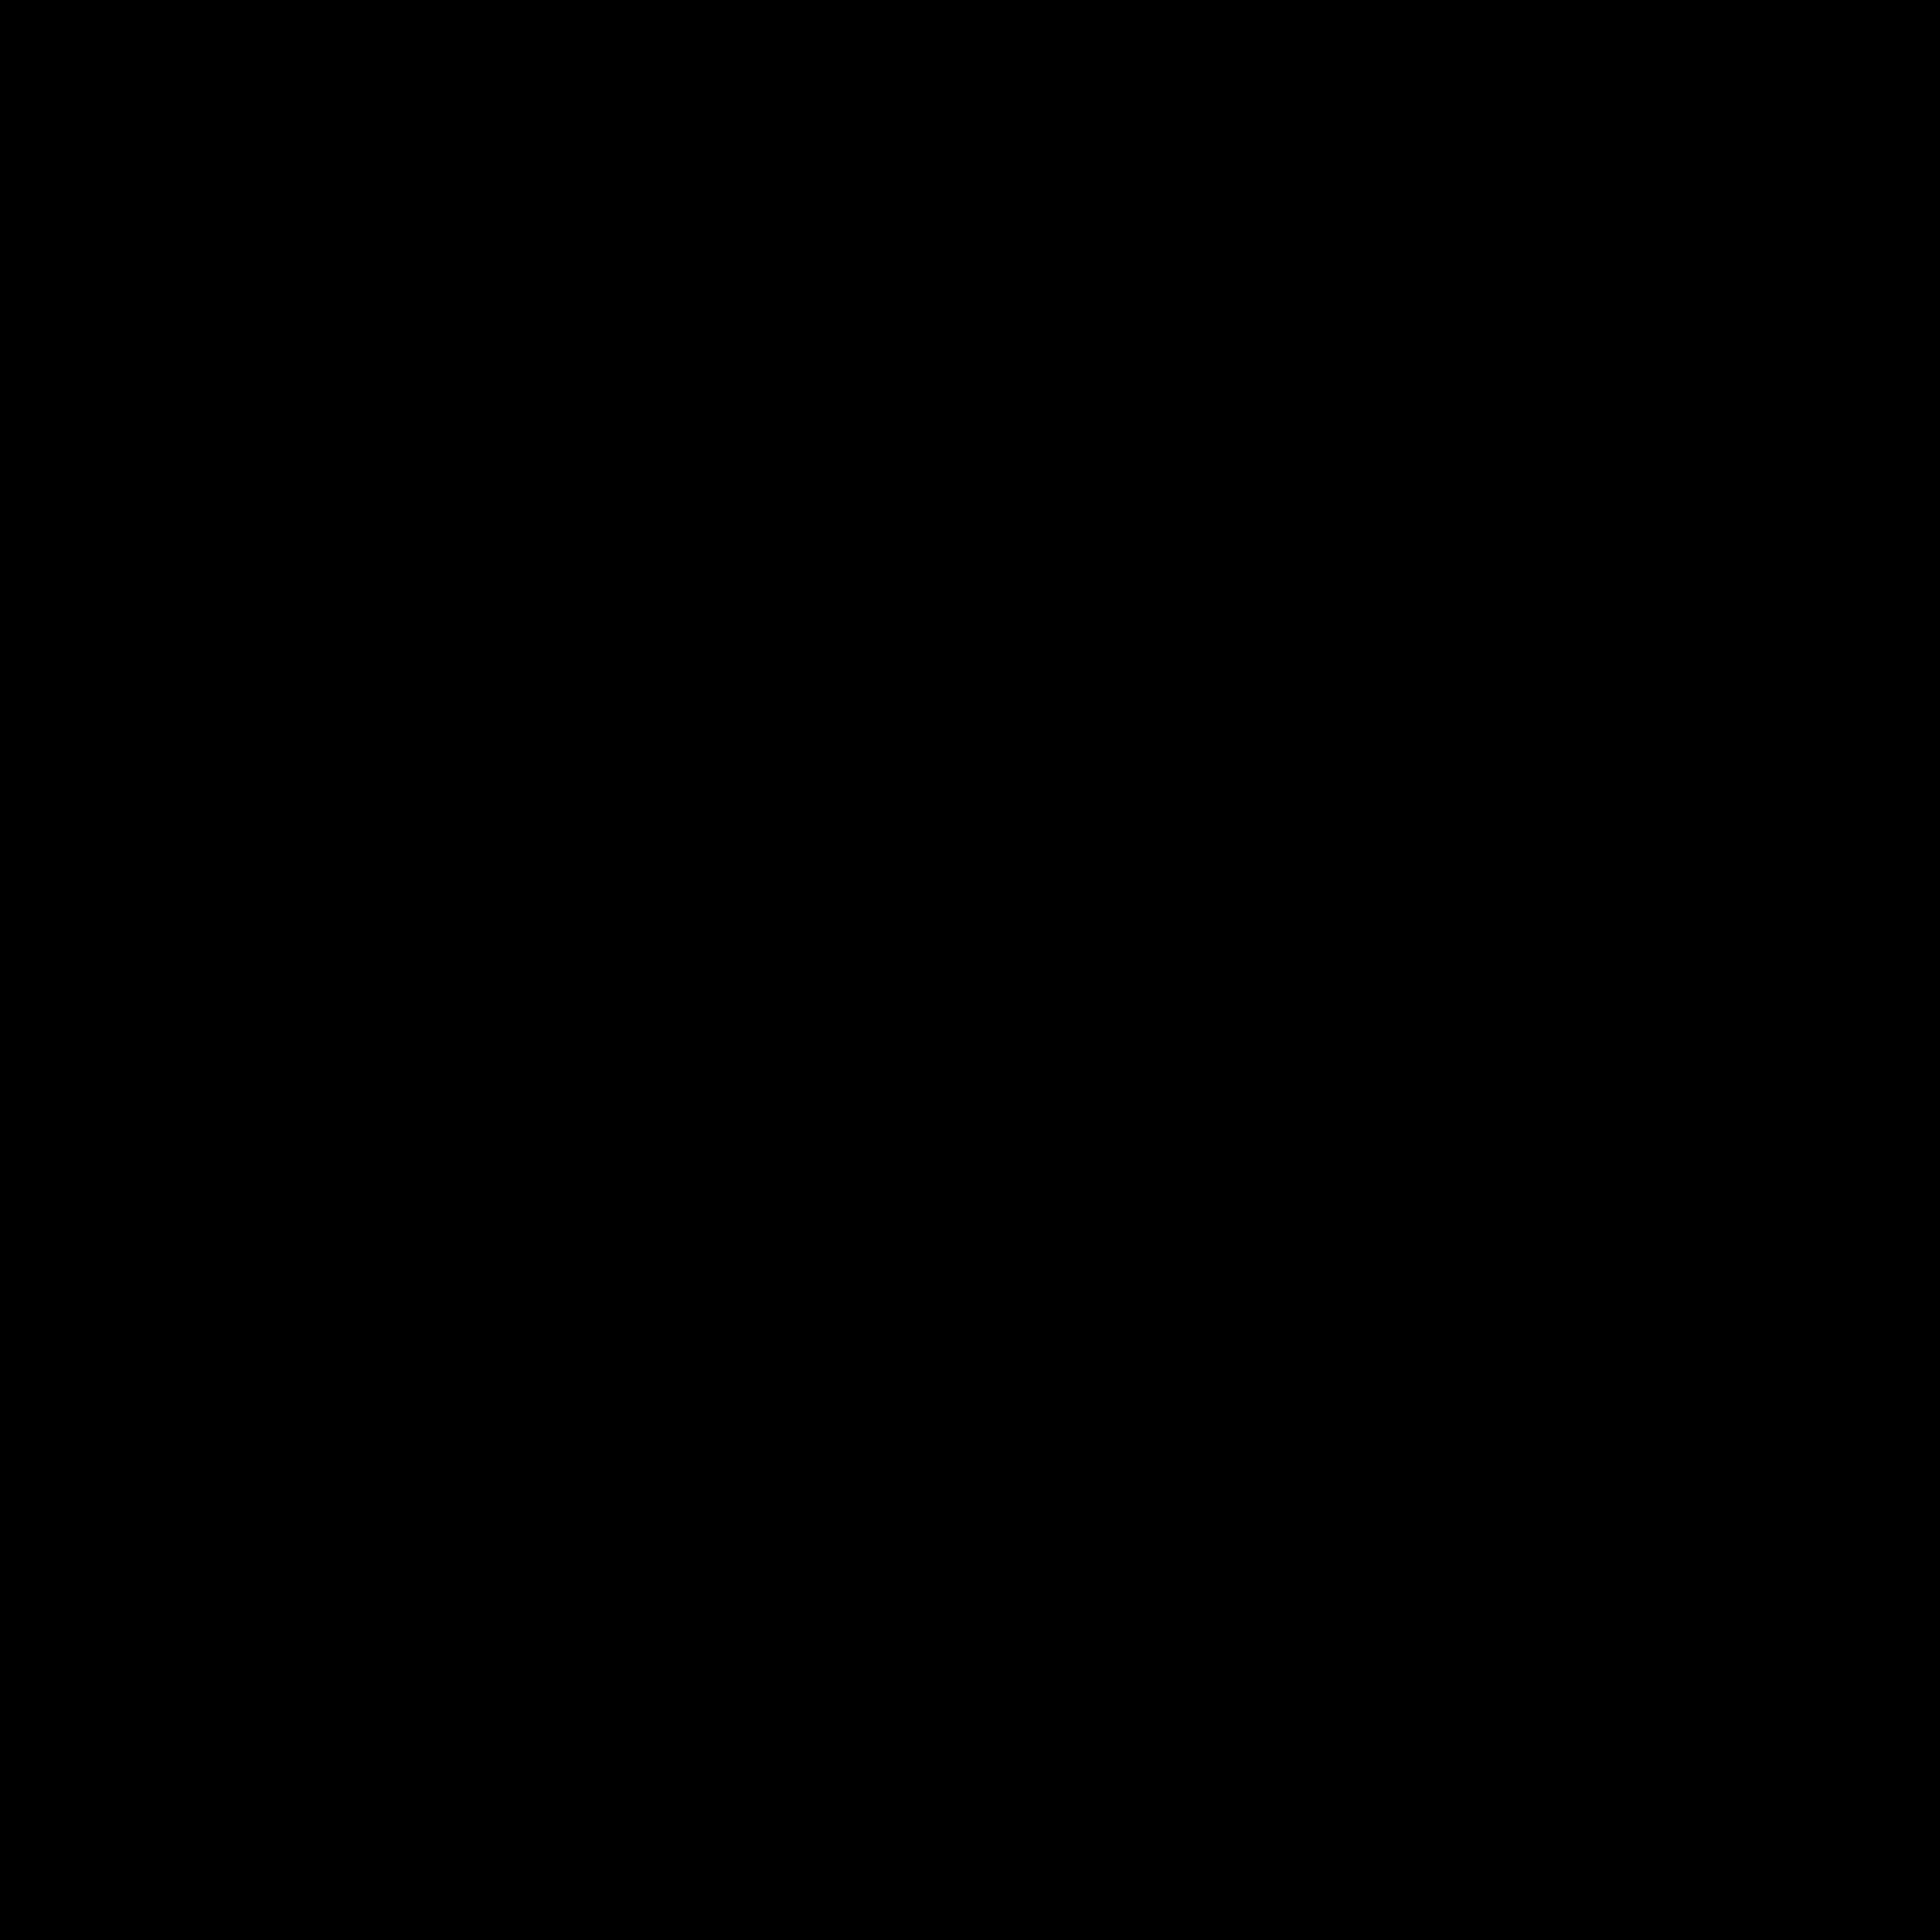 Cantori logotip